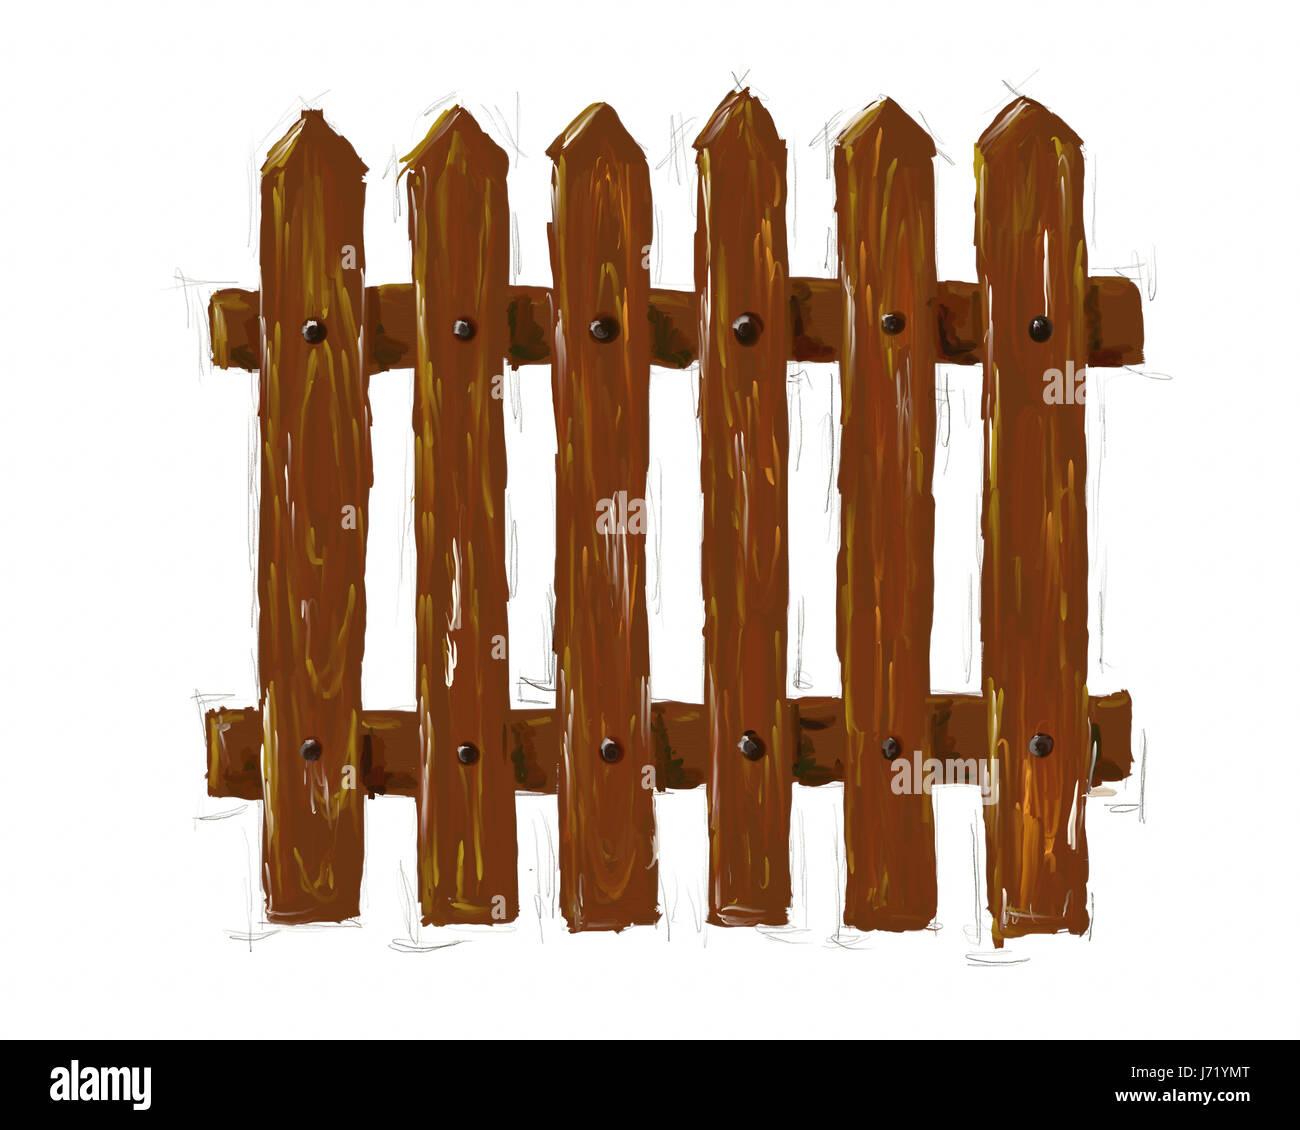 Wood row illustration fence border gate drawing photo picture stock photo wood row illustration fence border gate drawing photo picture image copy baanklon Choice Image